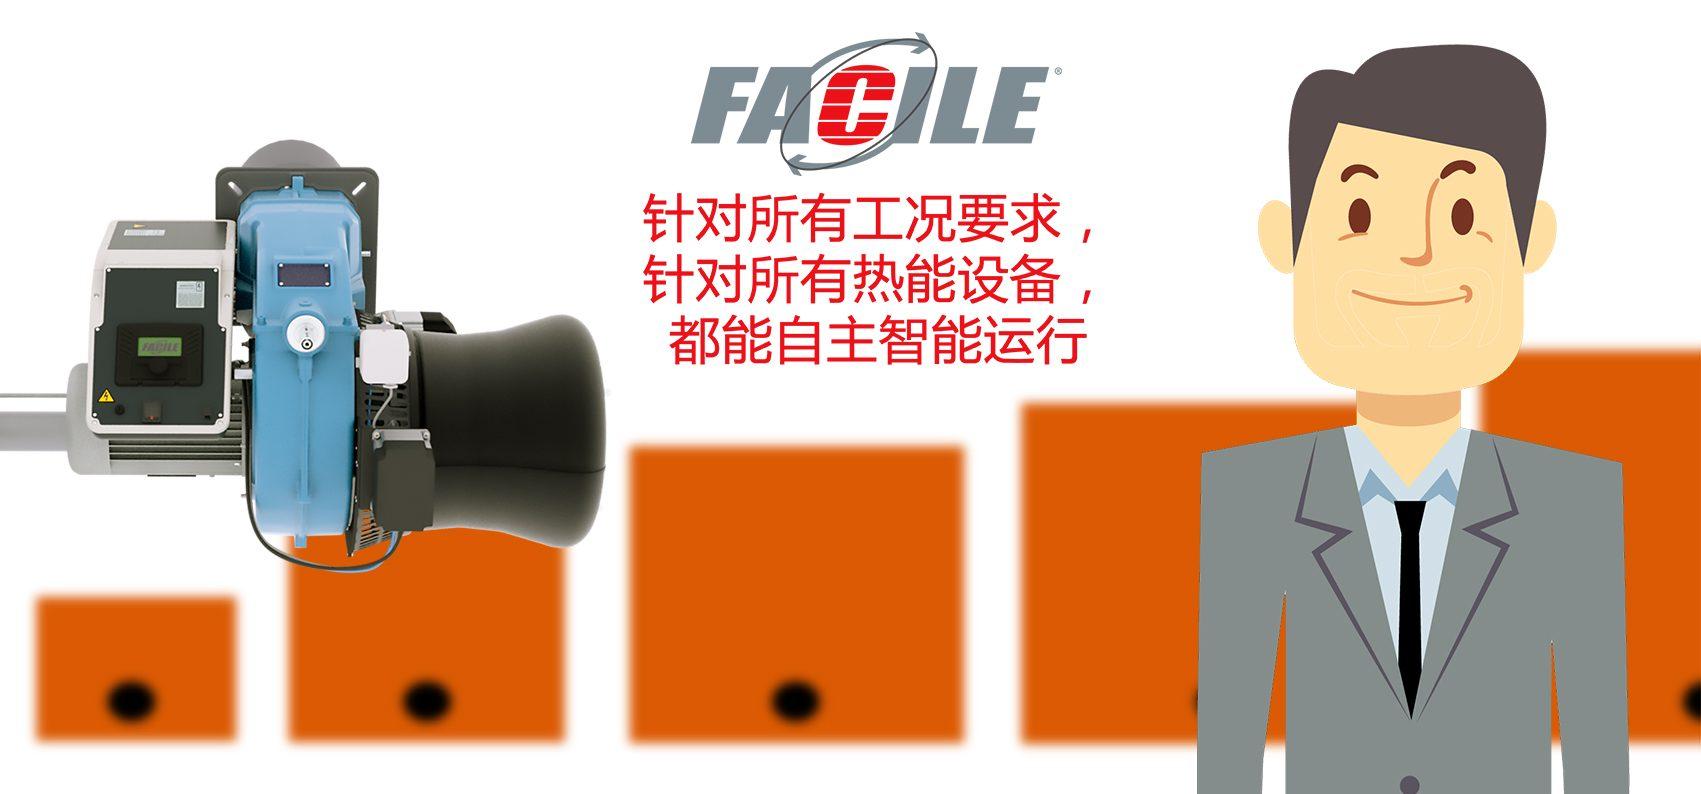 FACILE CIB Unigas 针对所有热能设备